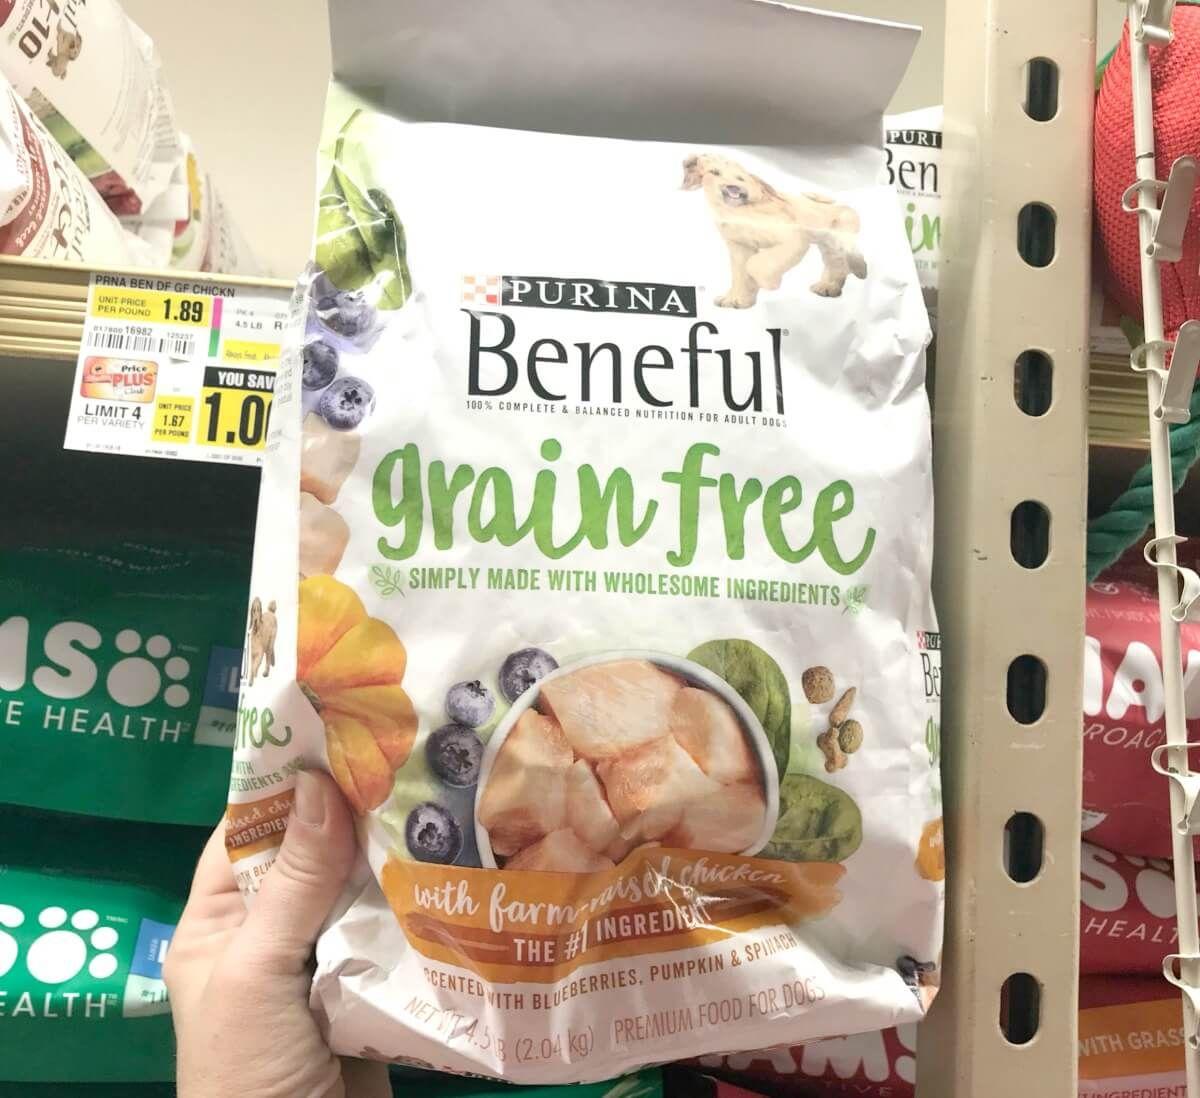 Beneful Dog Food Just 1 48 At Dollar General 11 8 11 10